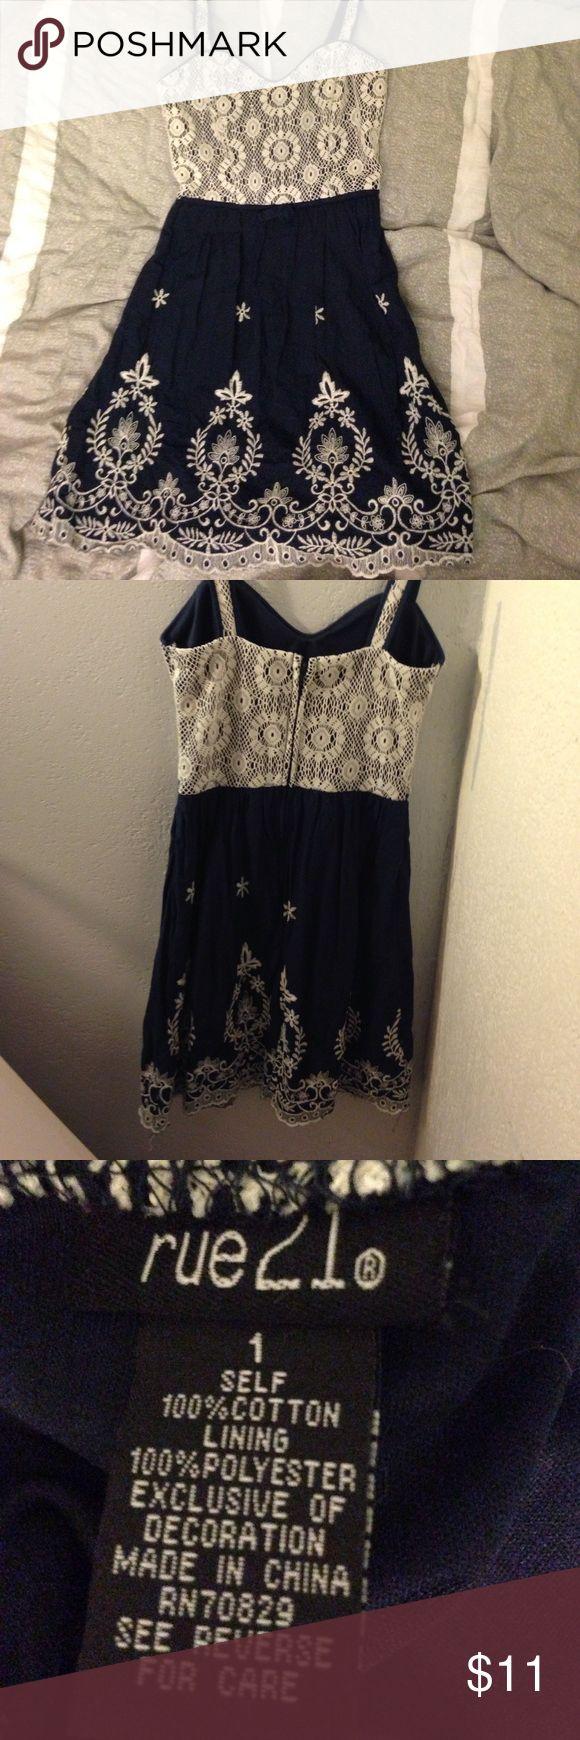 Lace in Front Short Back Long Dress in Black Rue21